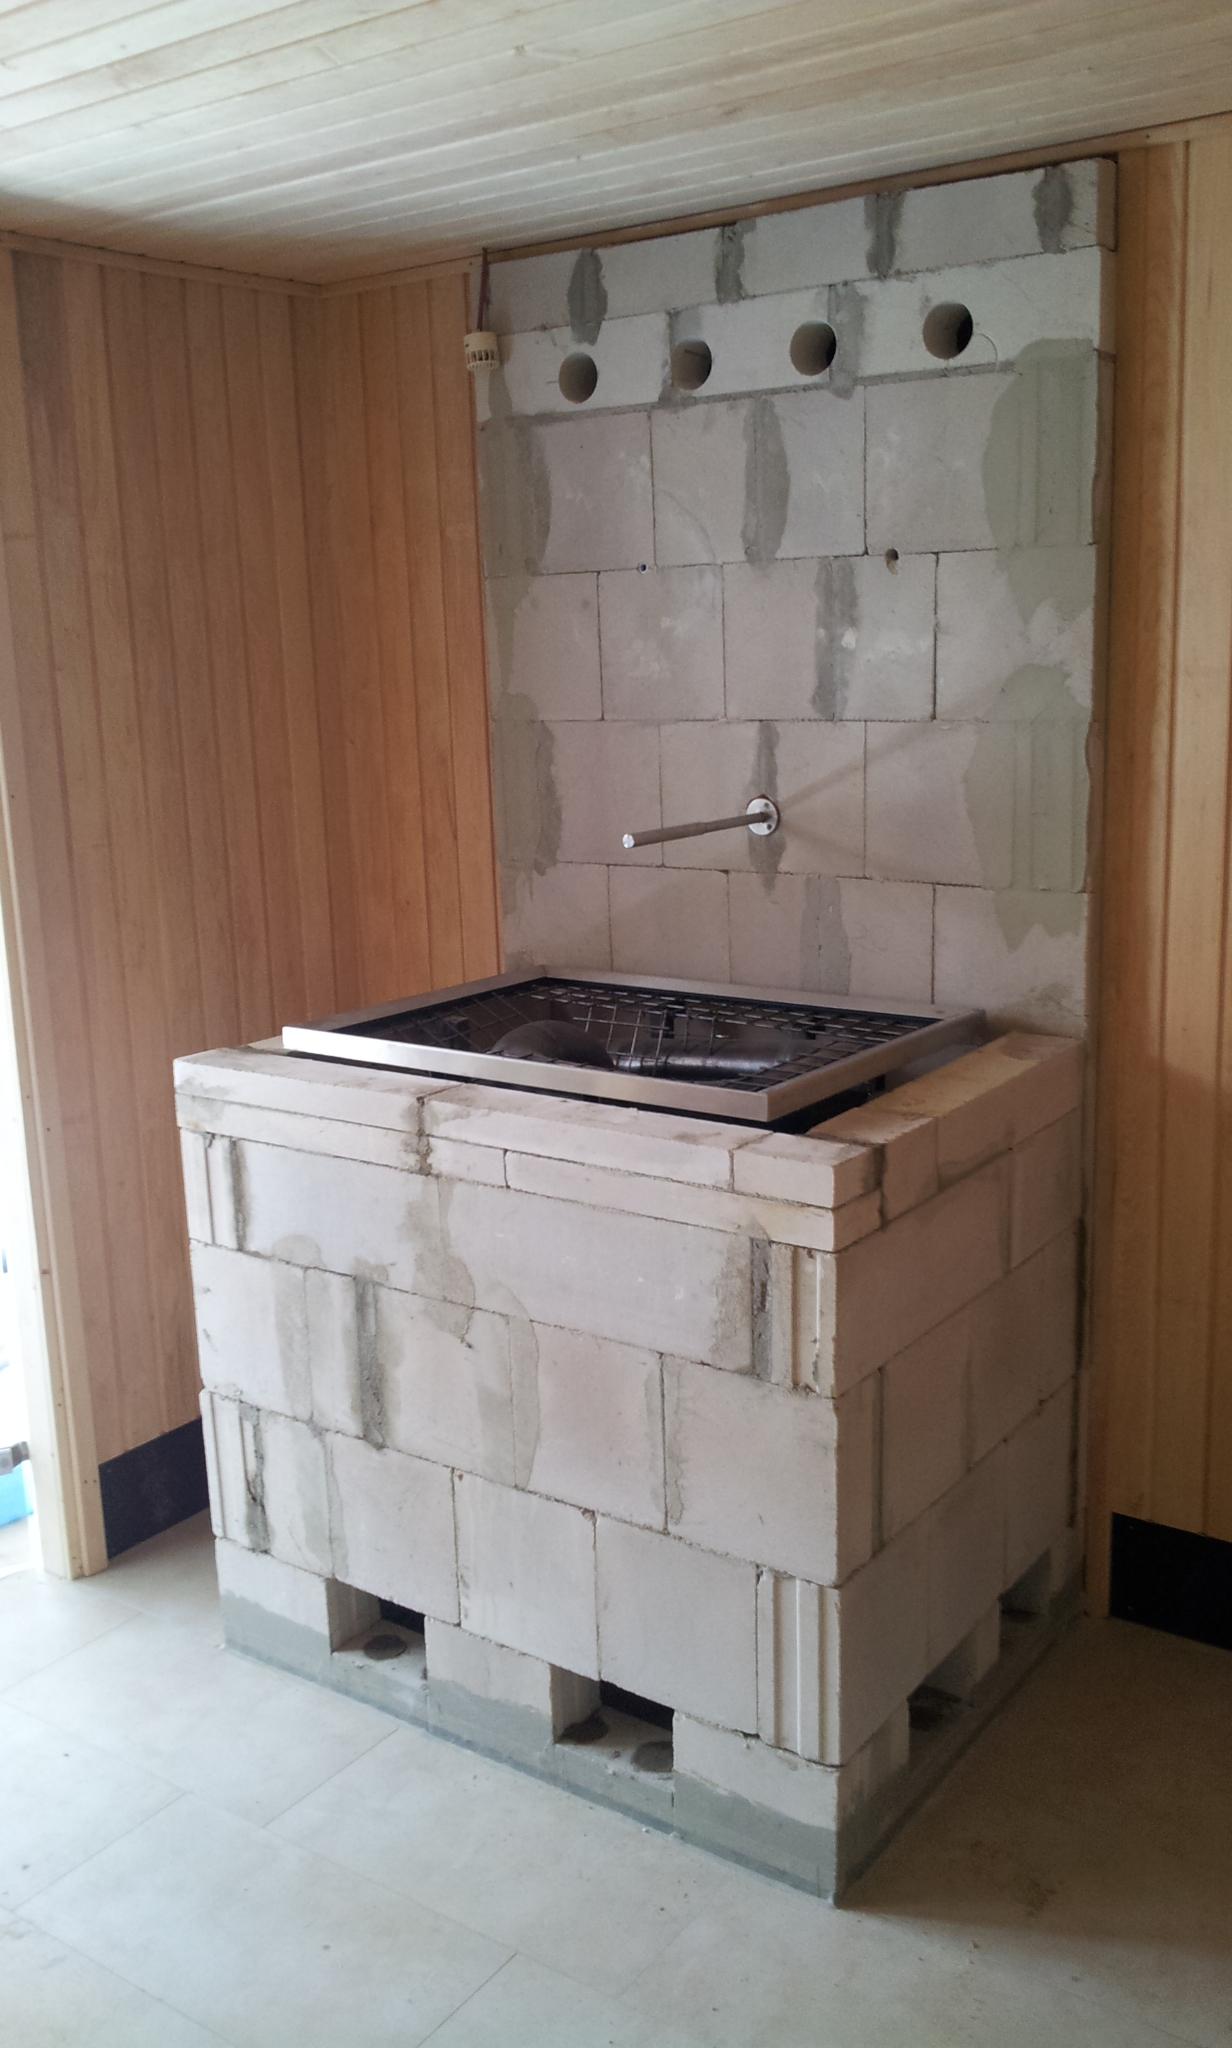 Saunagasofen rohbau wellnessdrops - Sauna whirlpool ...